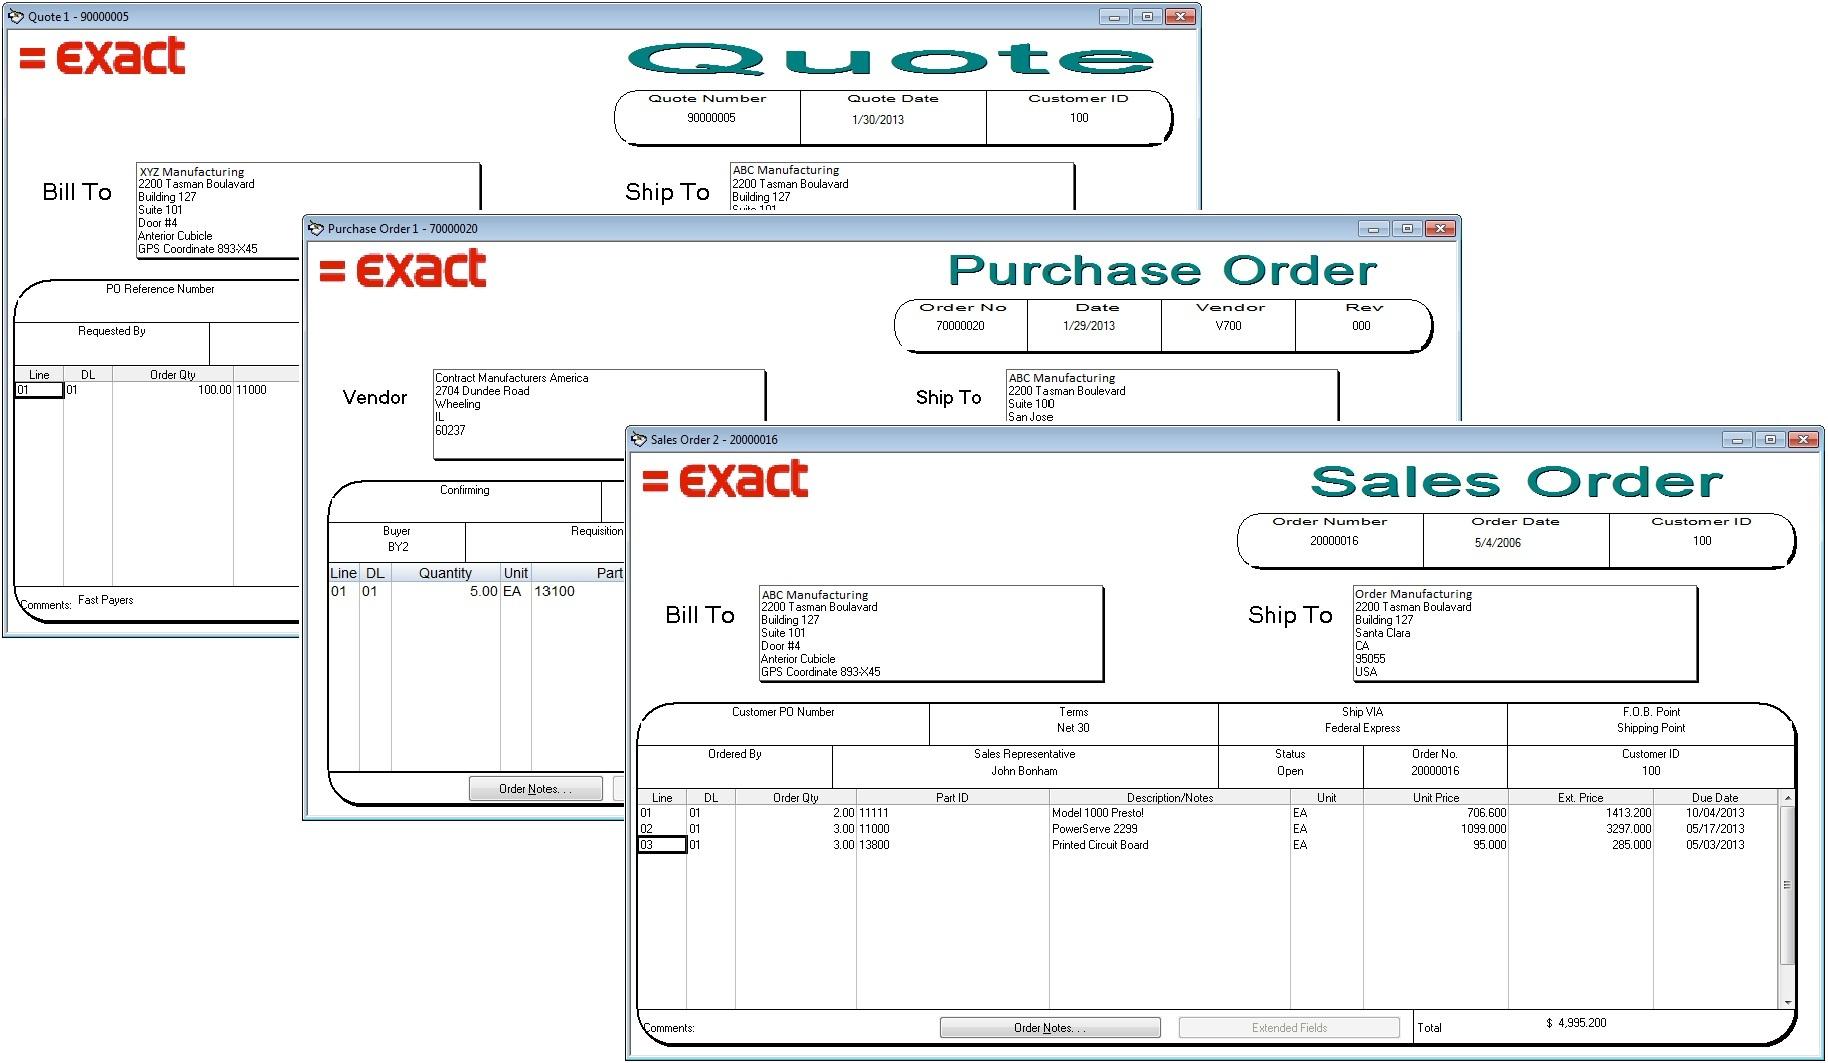 Quote, PO, Sales Order